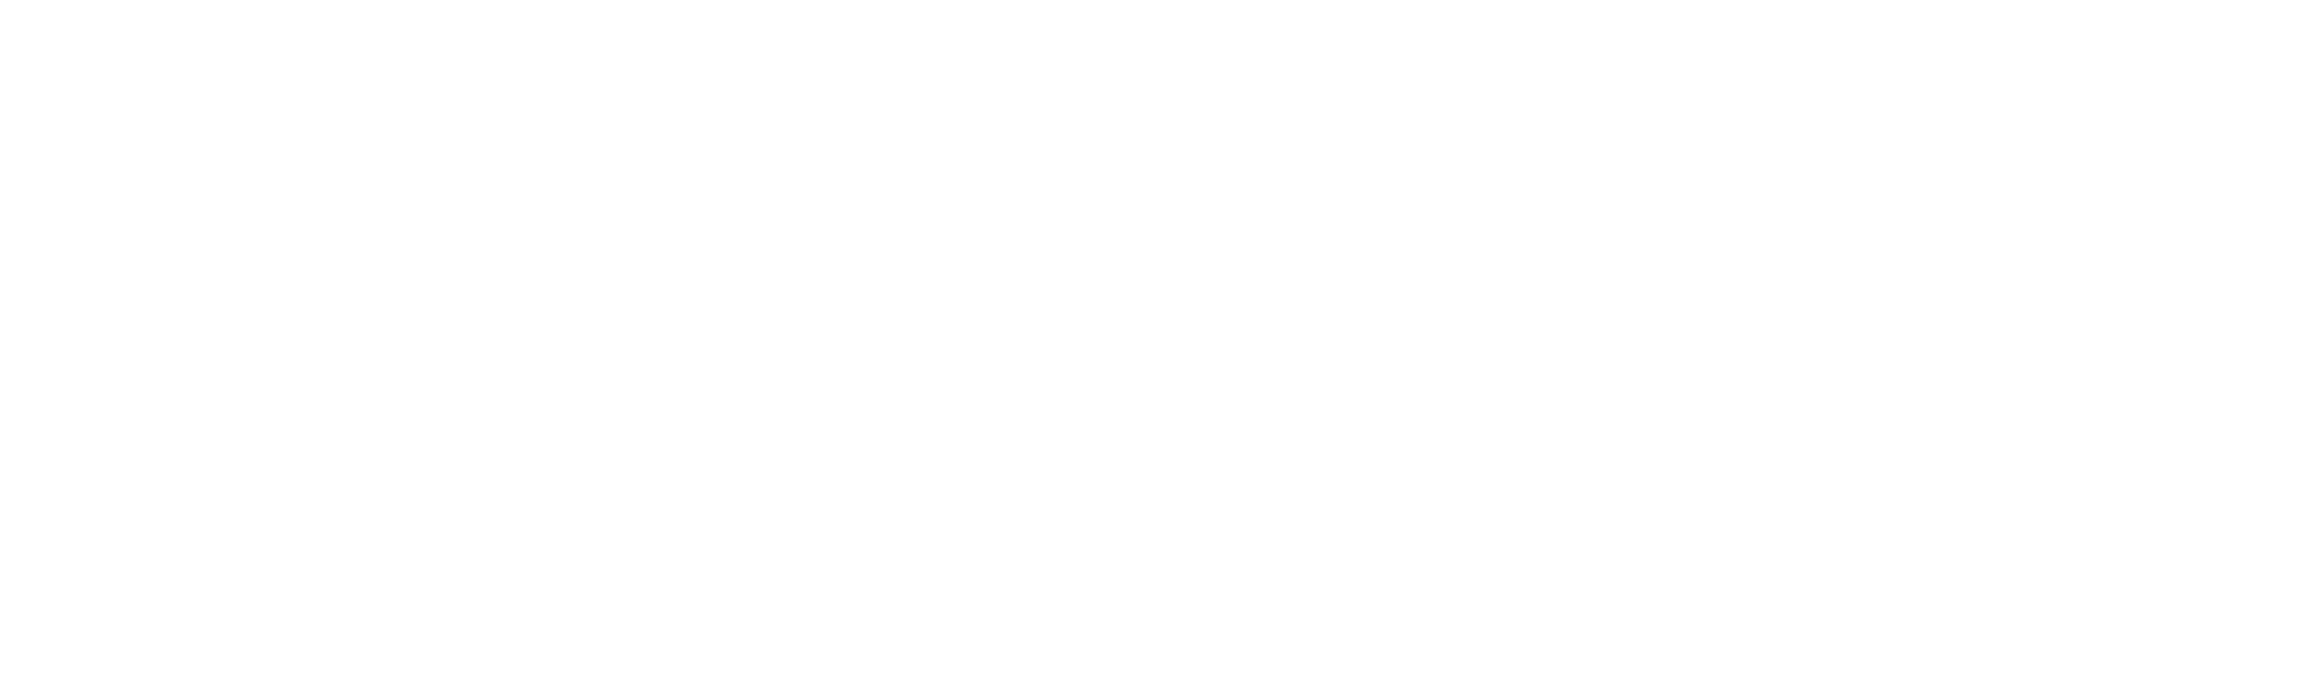 Hercules New York Logo White 3.png